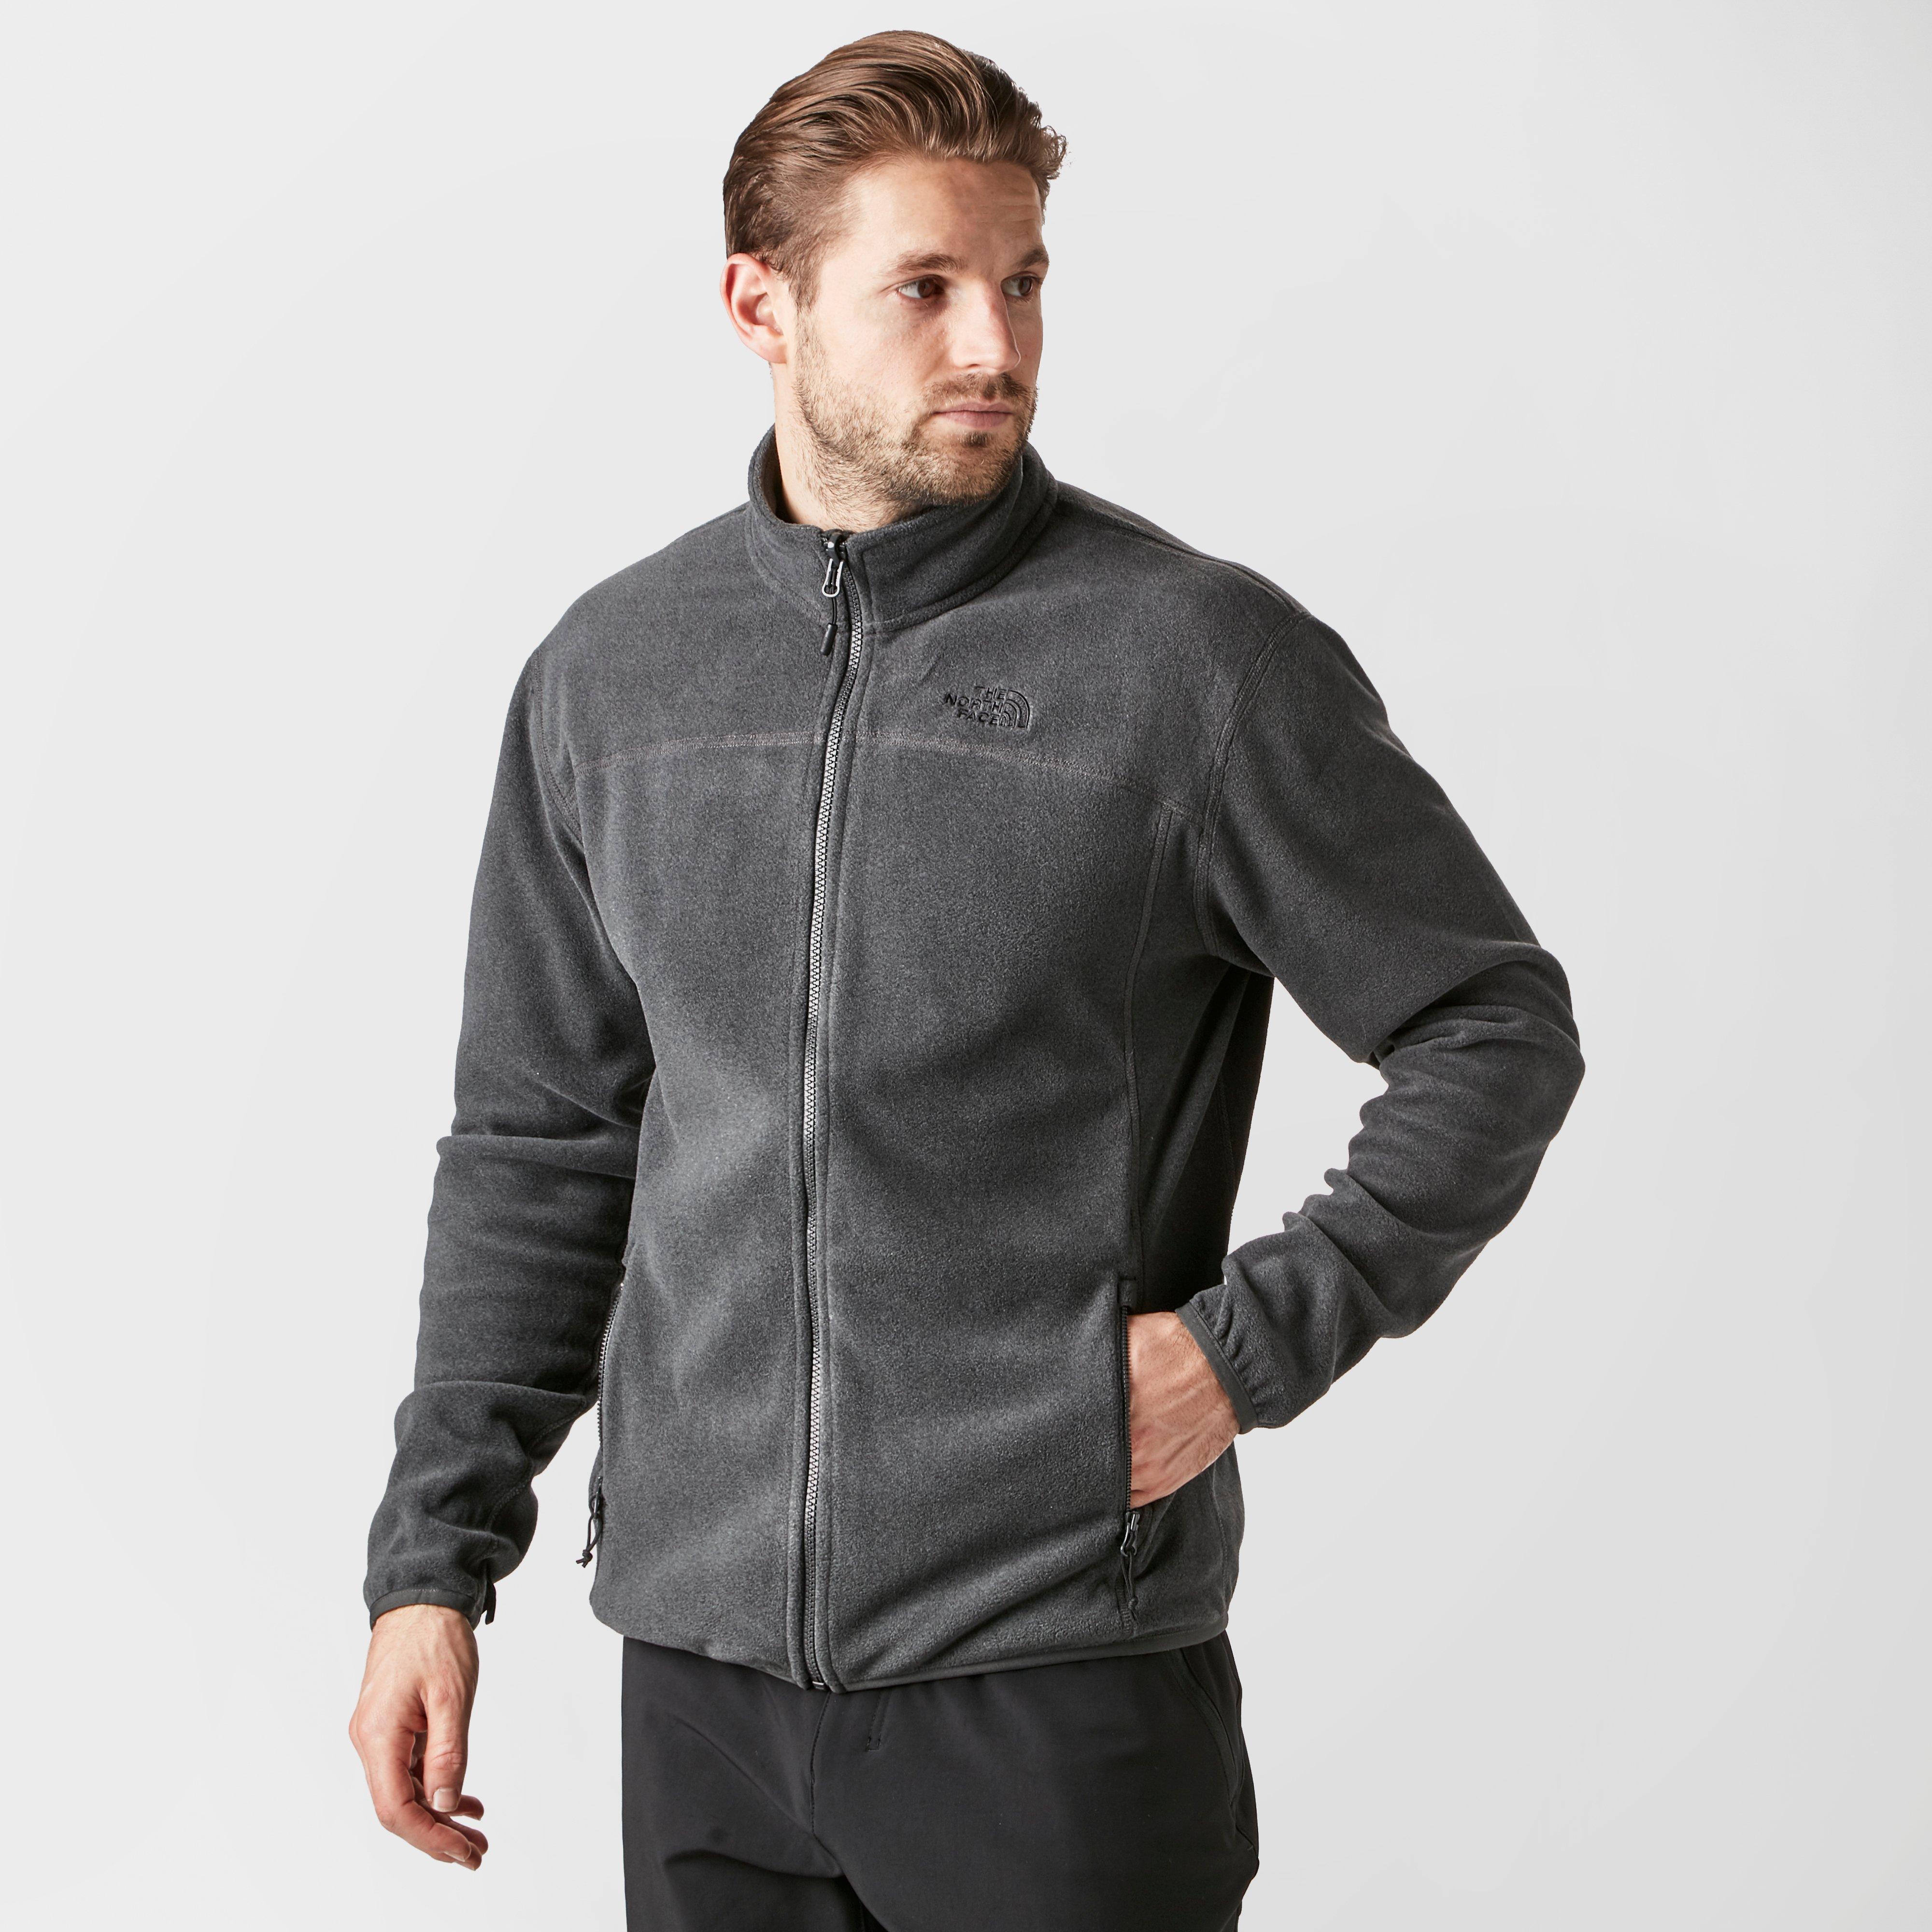 12bf95d1cd41 Details about New The North Face Men s 100 Glacier Full Zip Fleece Jacket